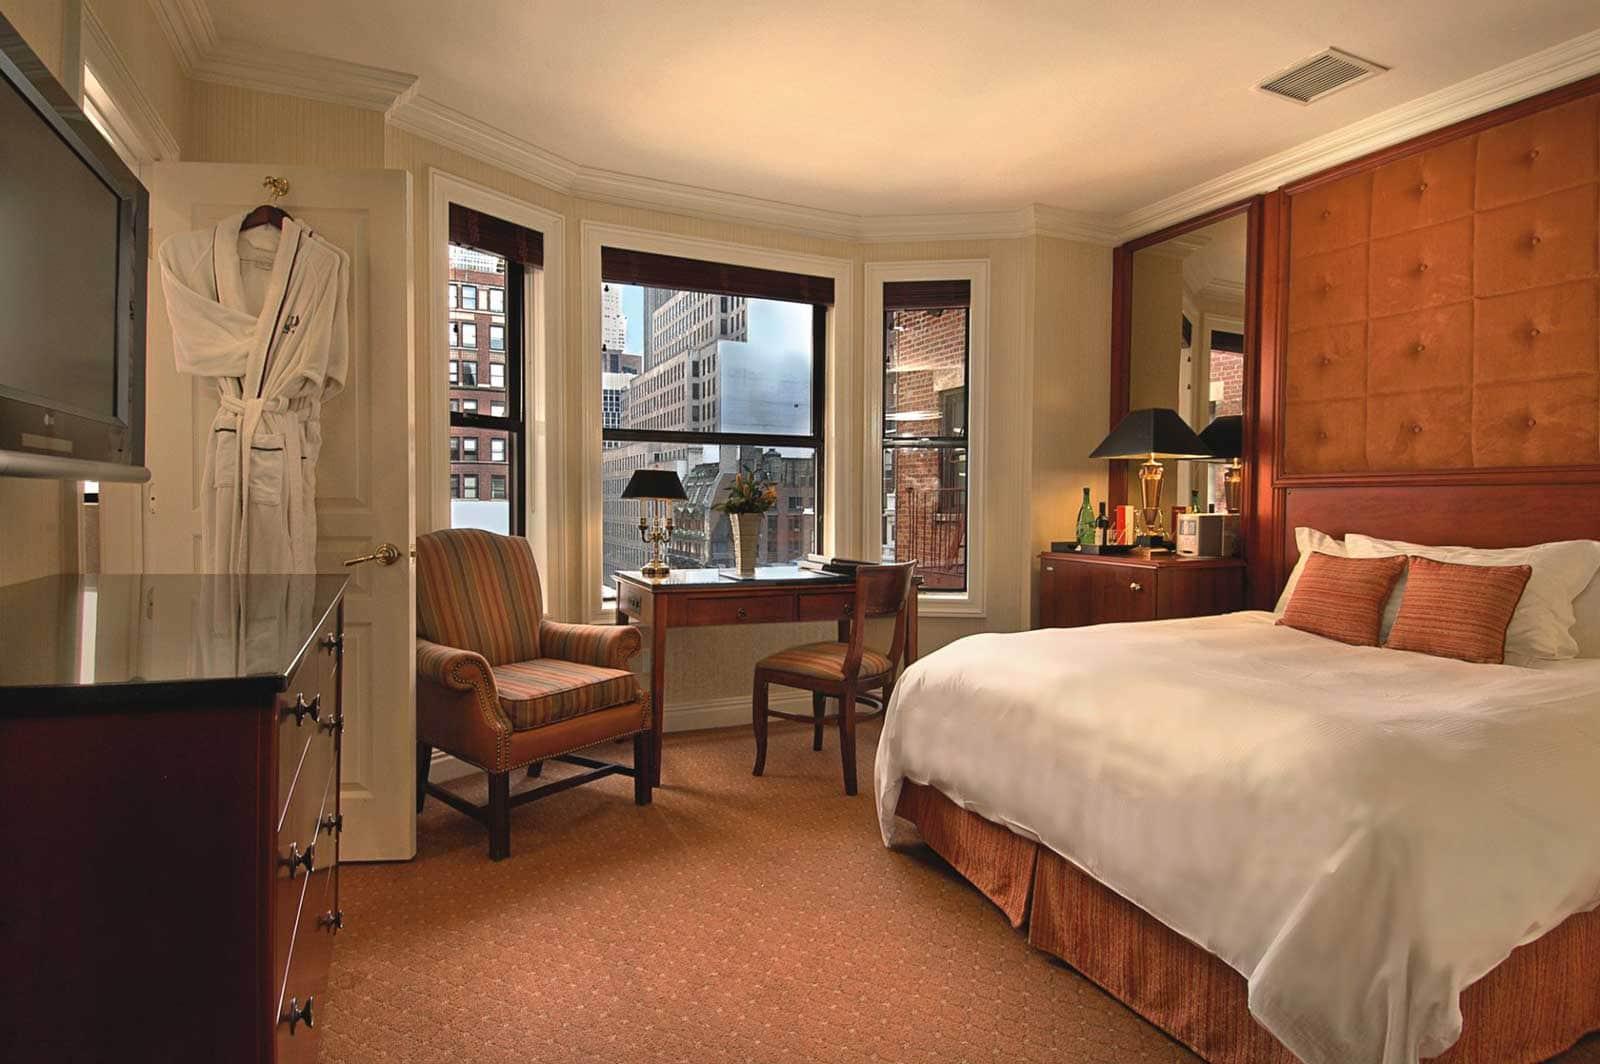 Best new york hotels iroquois hotel